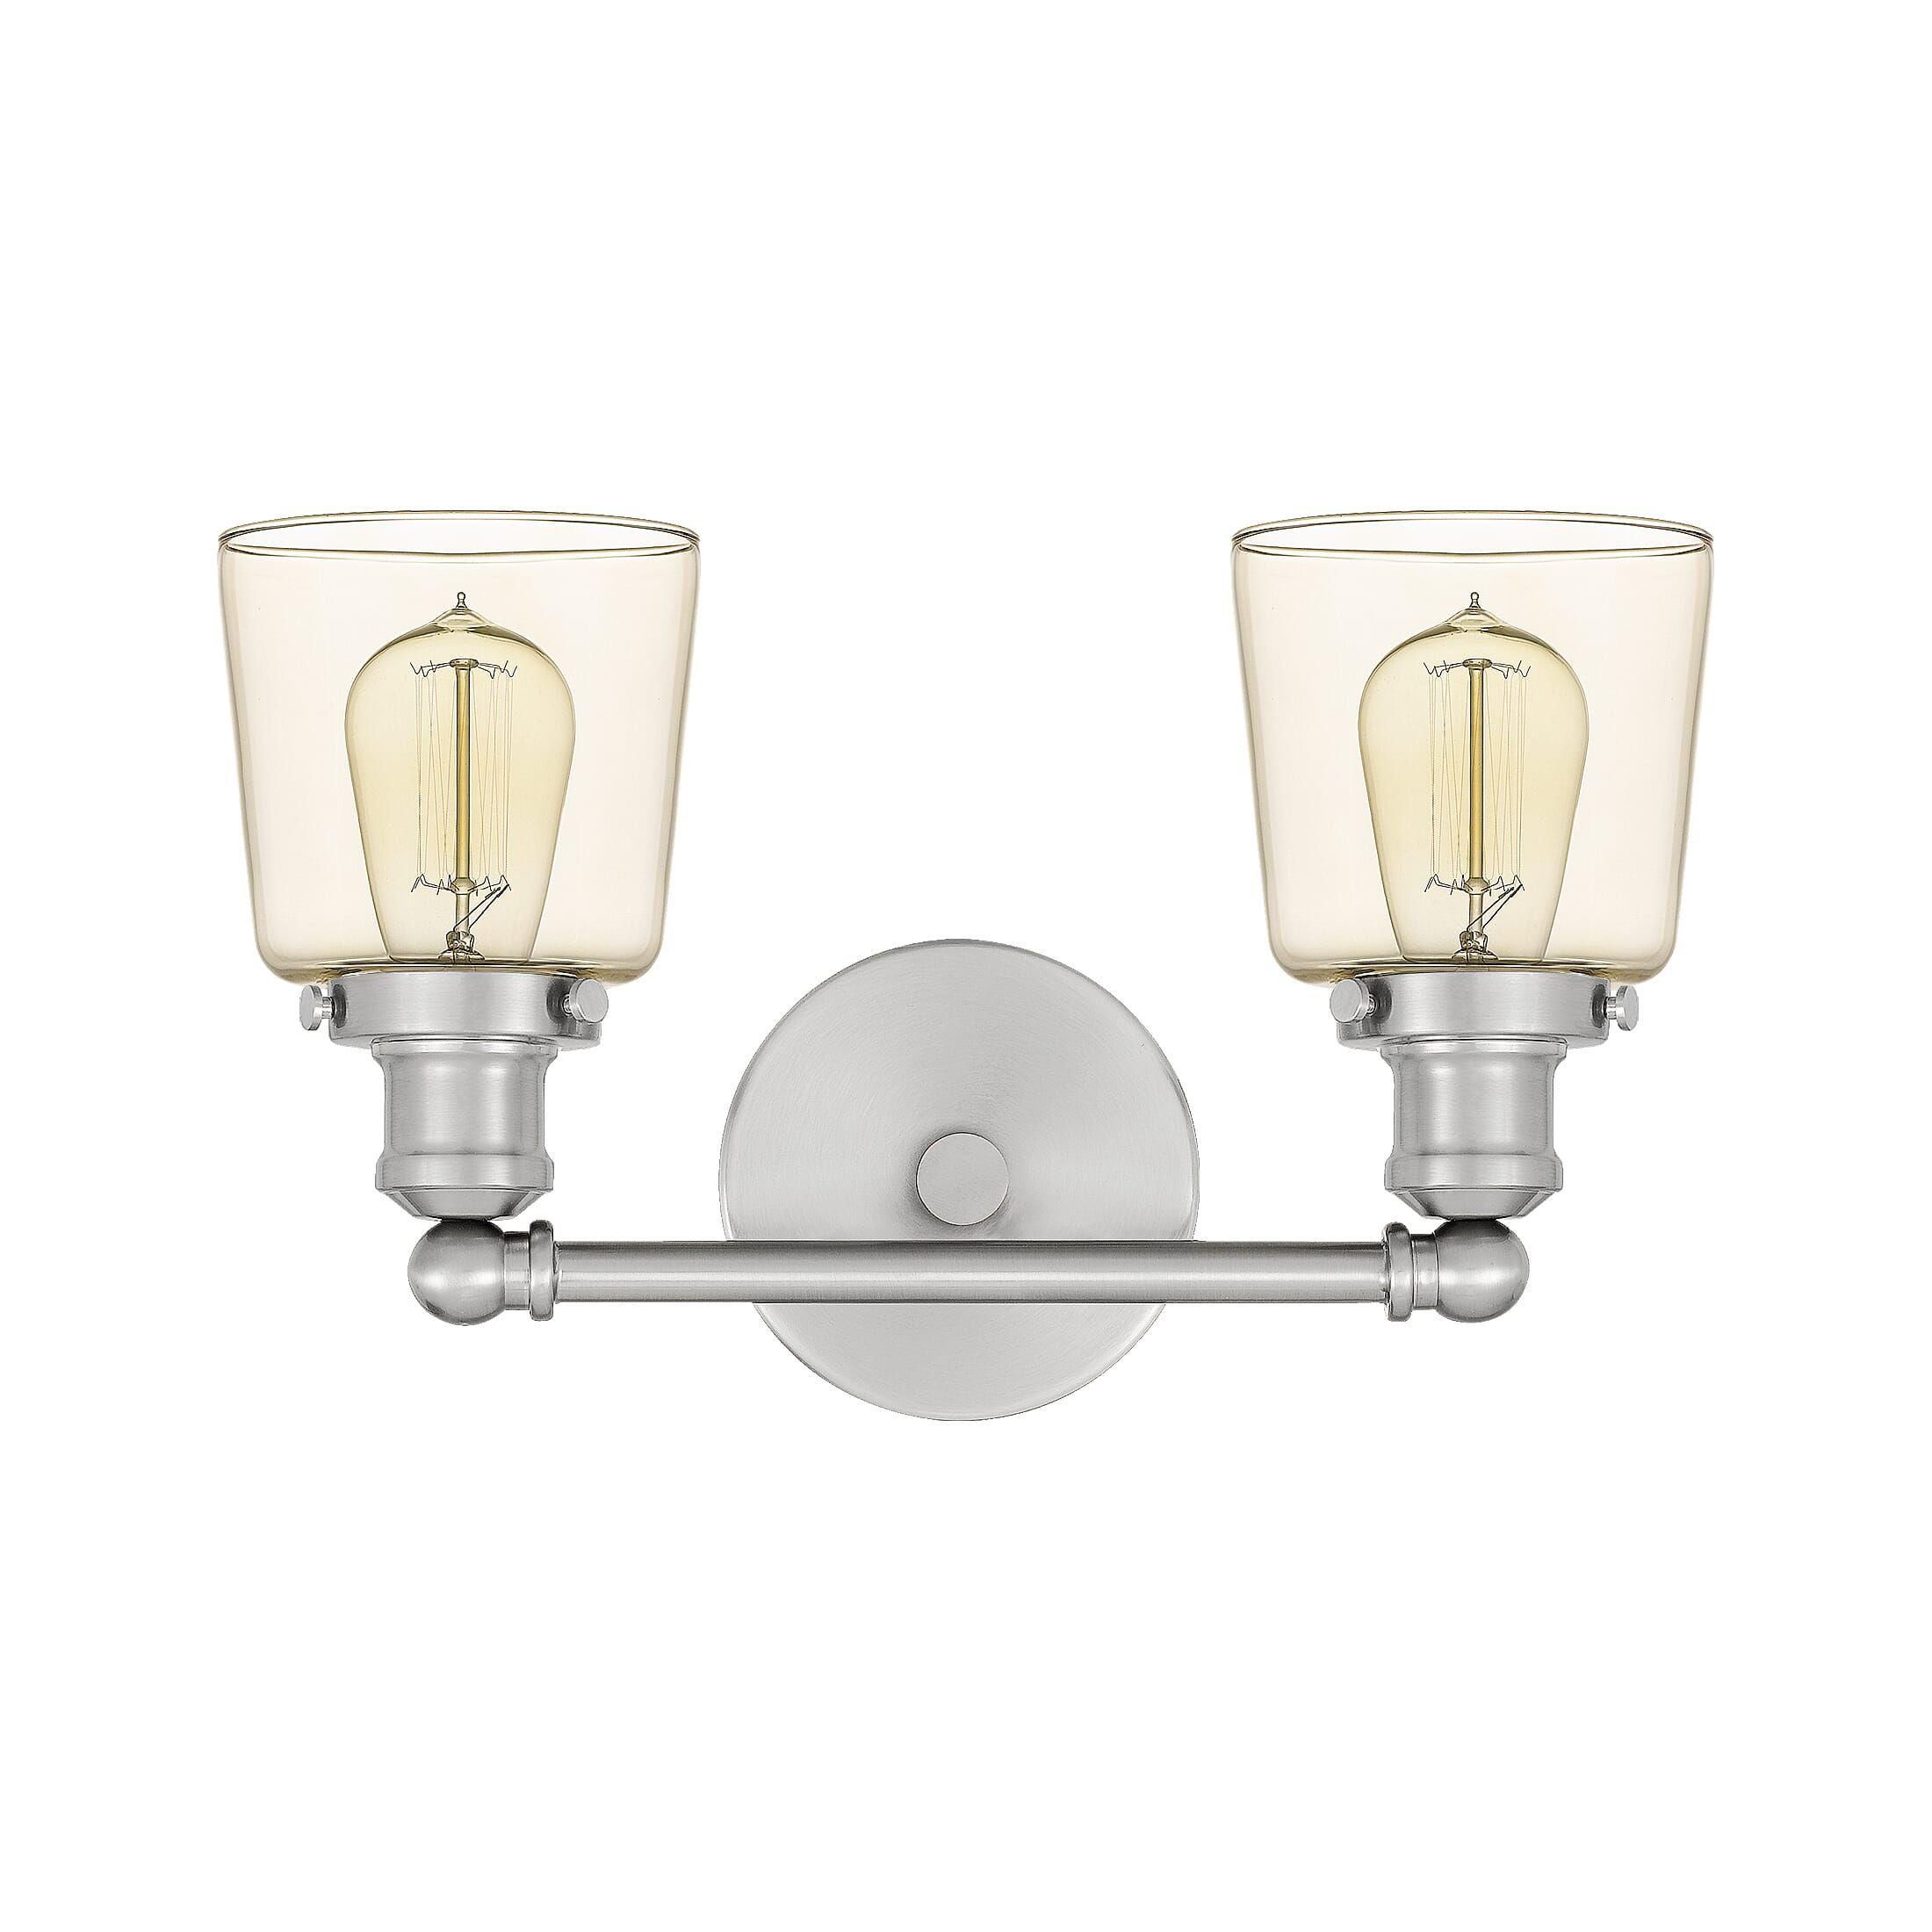 Photo of Quoizel Union 2-Light 9″ Bathroom Vanity Light in Brushed Nickel